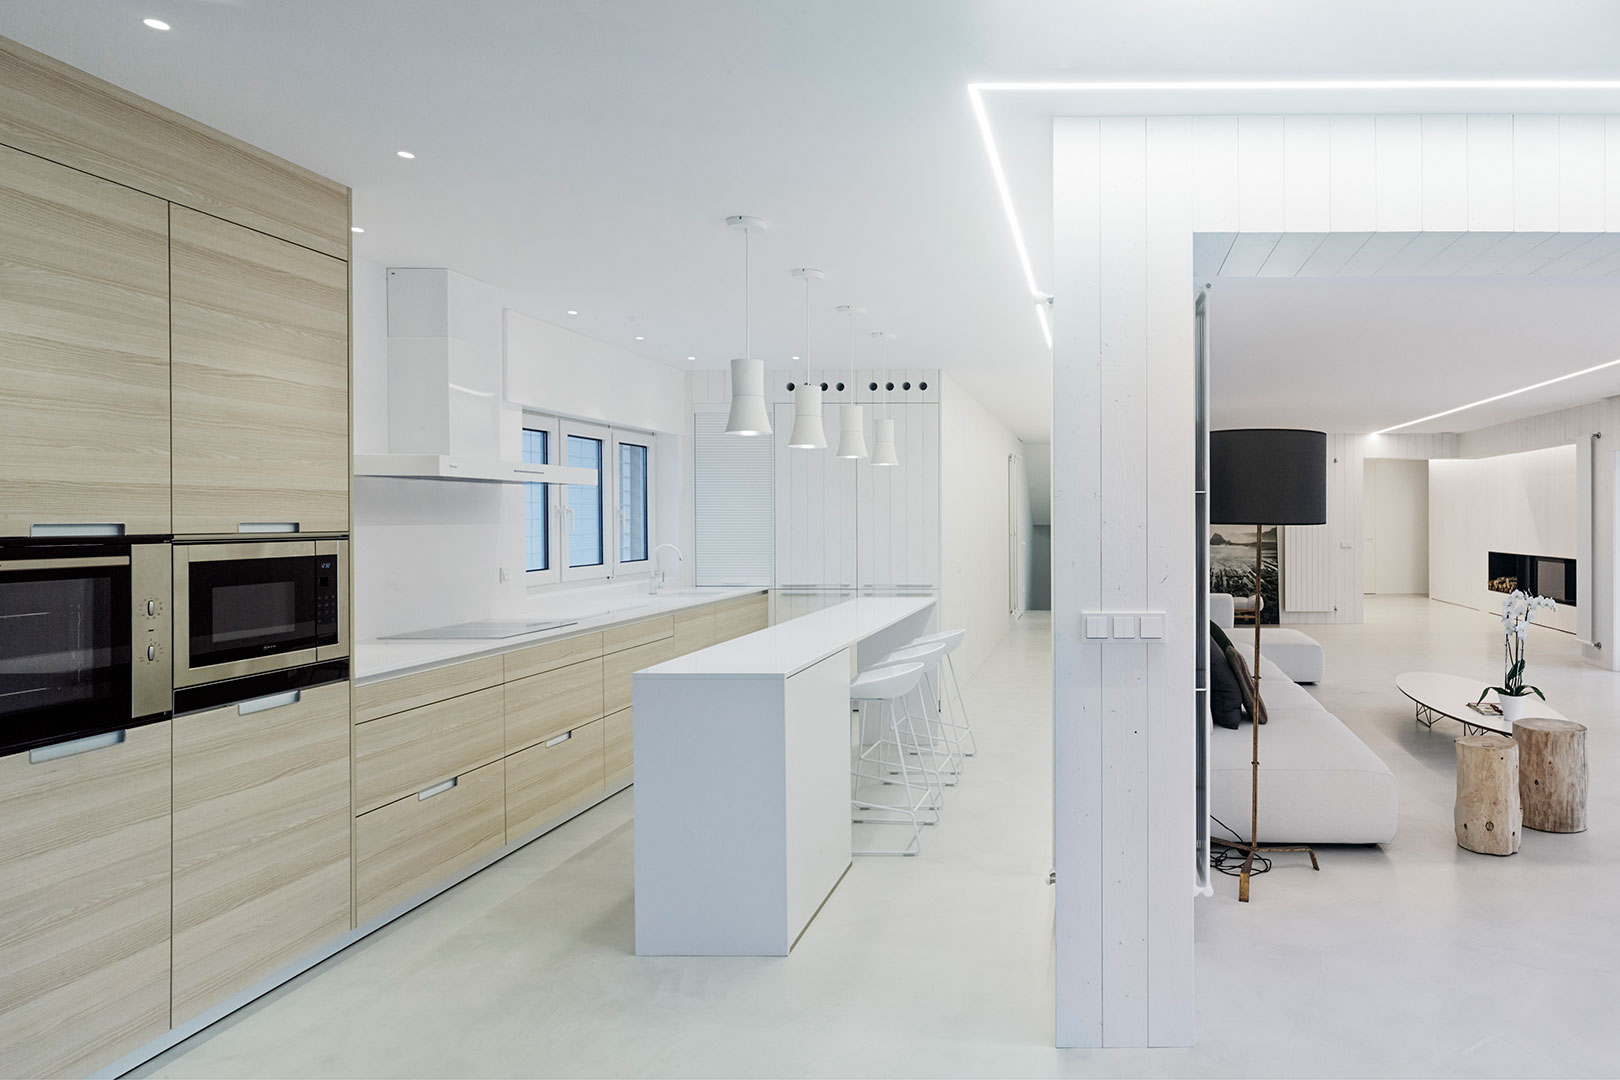 Isla de cocina con barra